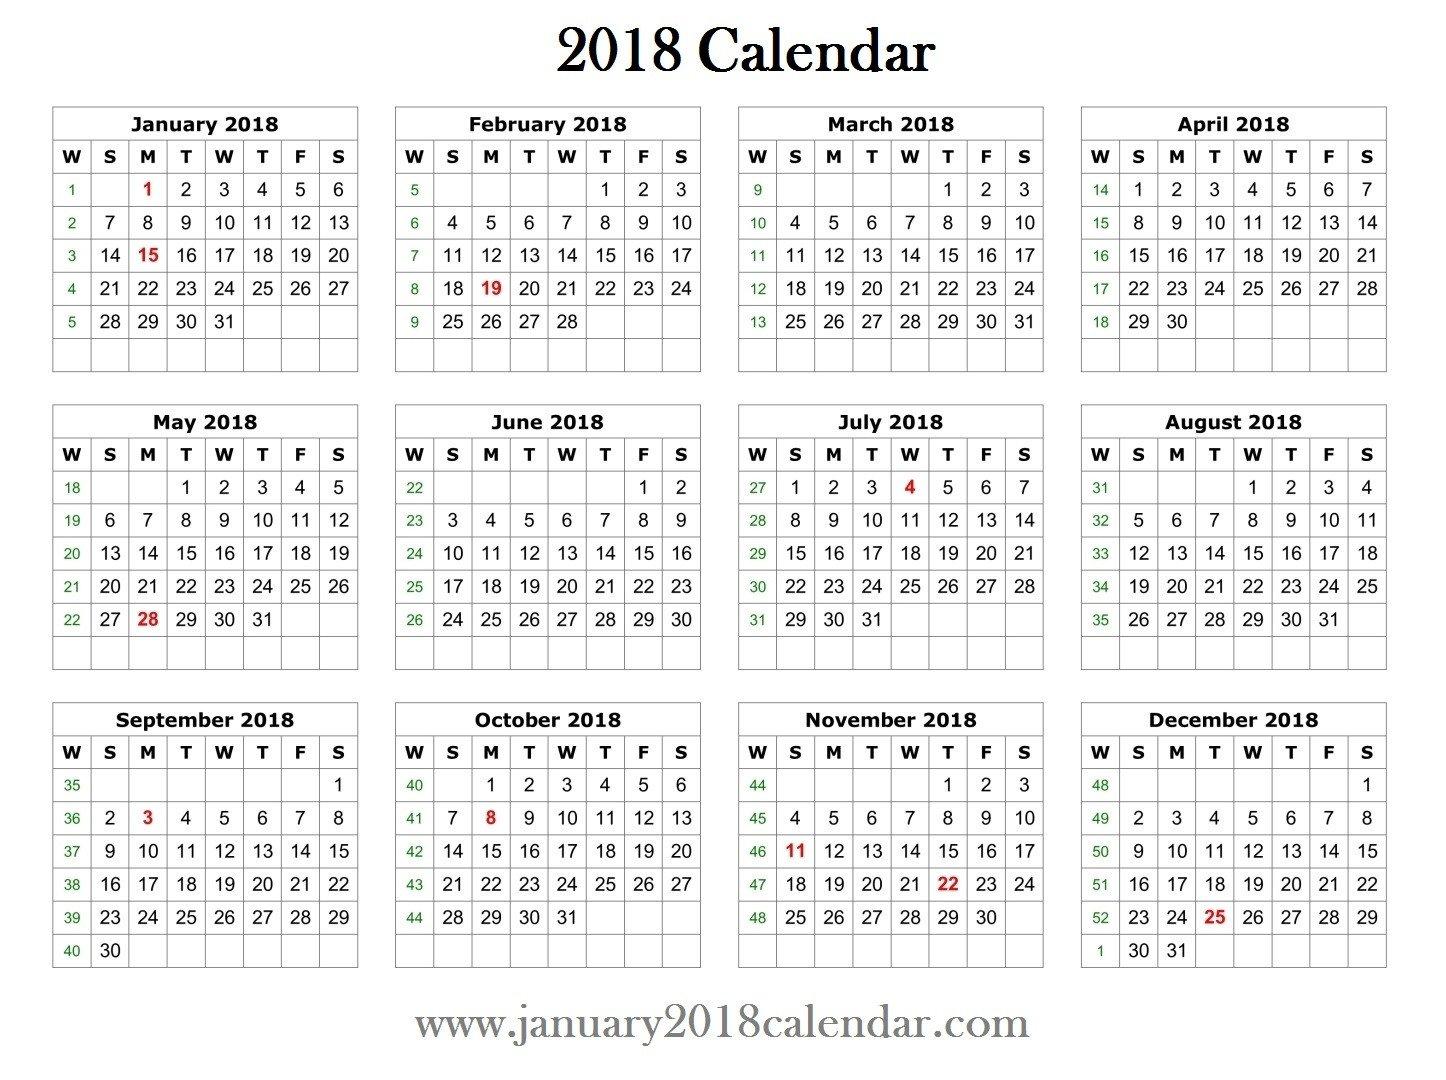 Calendar Template for Word 2018 Printable Word Calendar Template